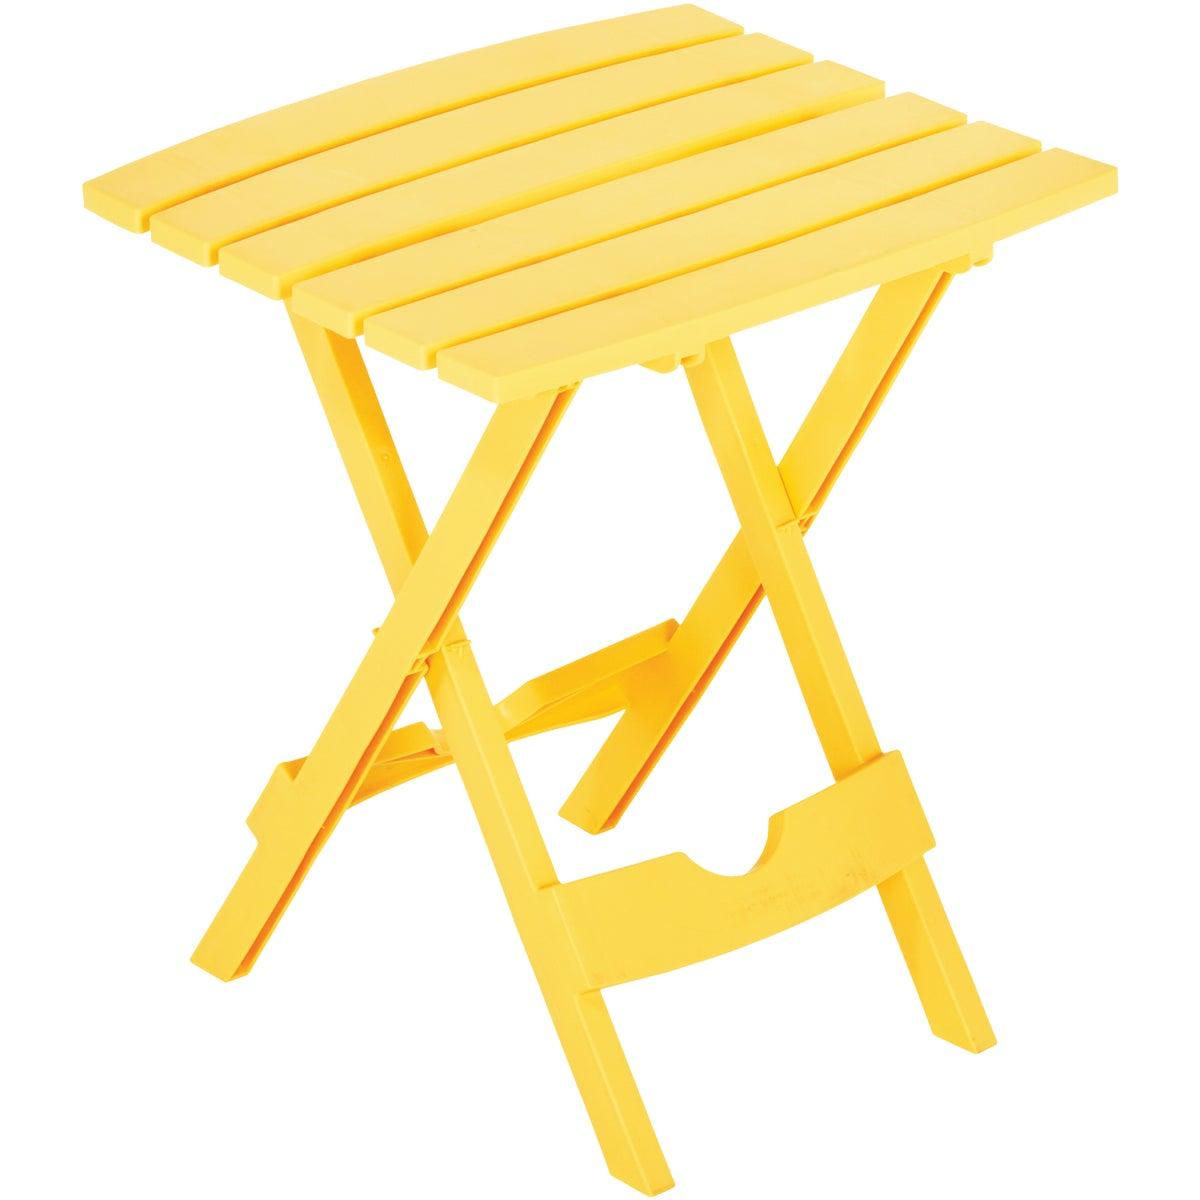 YELLOW QK FOLD TABLE - 8500-19-4748 by Adams Mfg Patio Furn